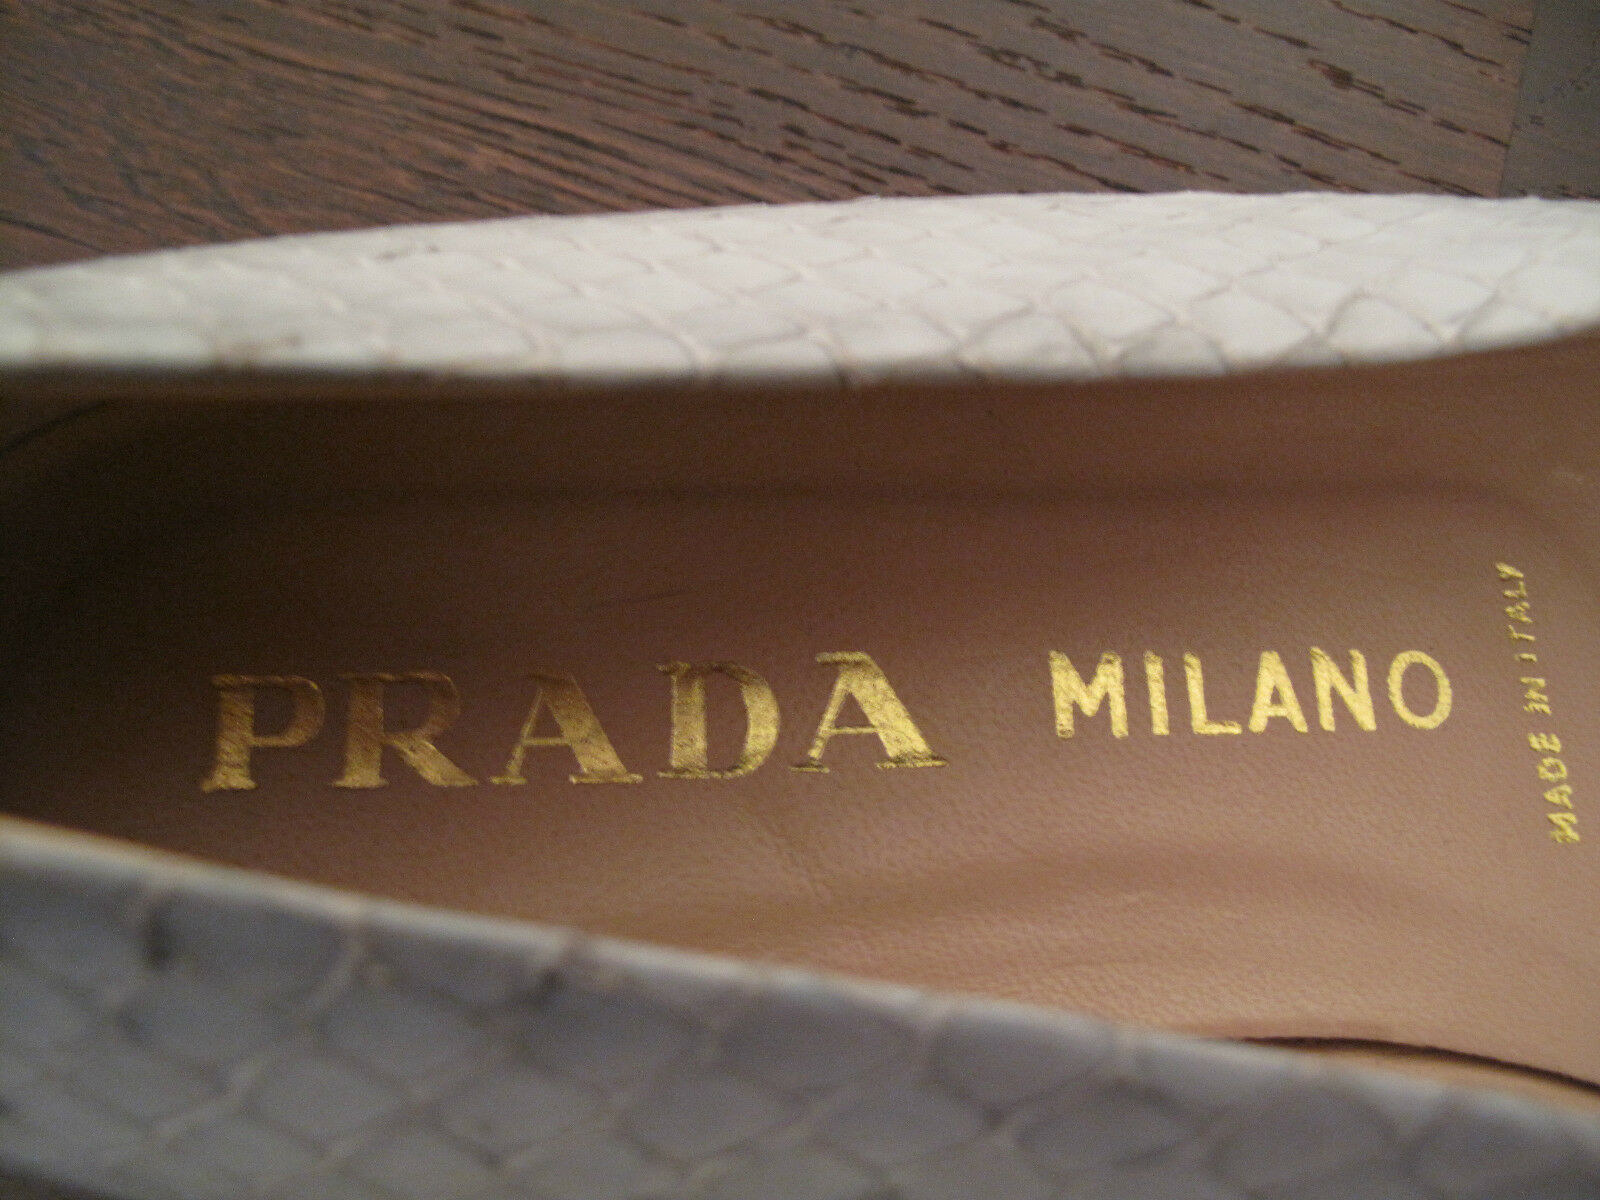 Original Prada Damen Schuhe Gr Ballerinas Echt Leder hellblau Gr Schuhe 39 gute Zustand c64f31